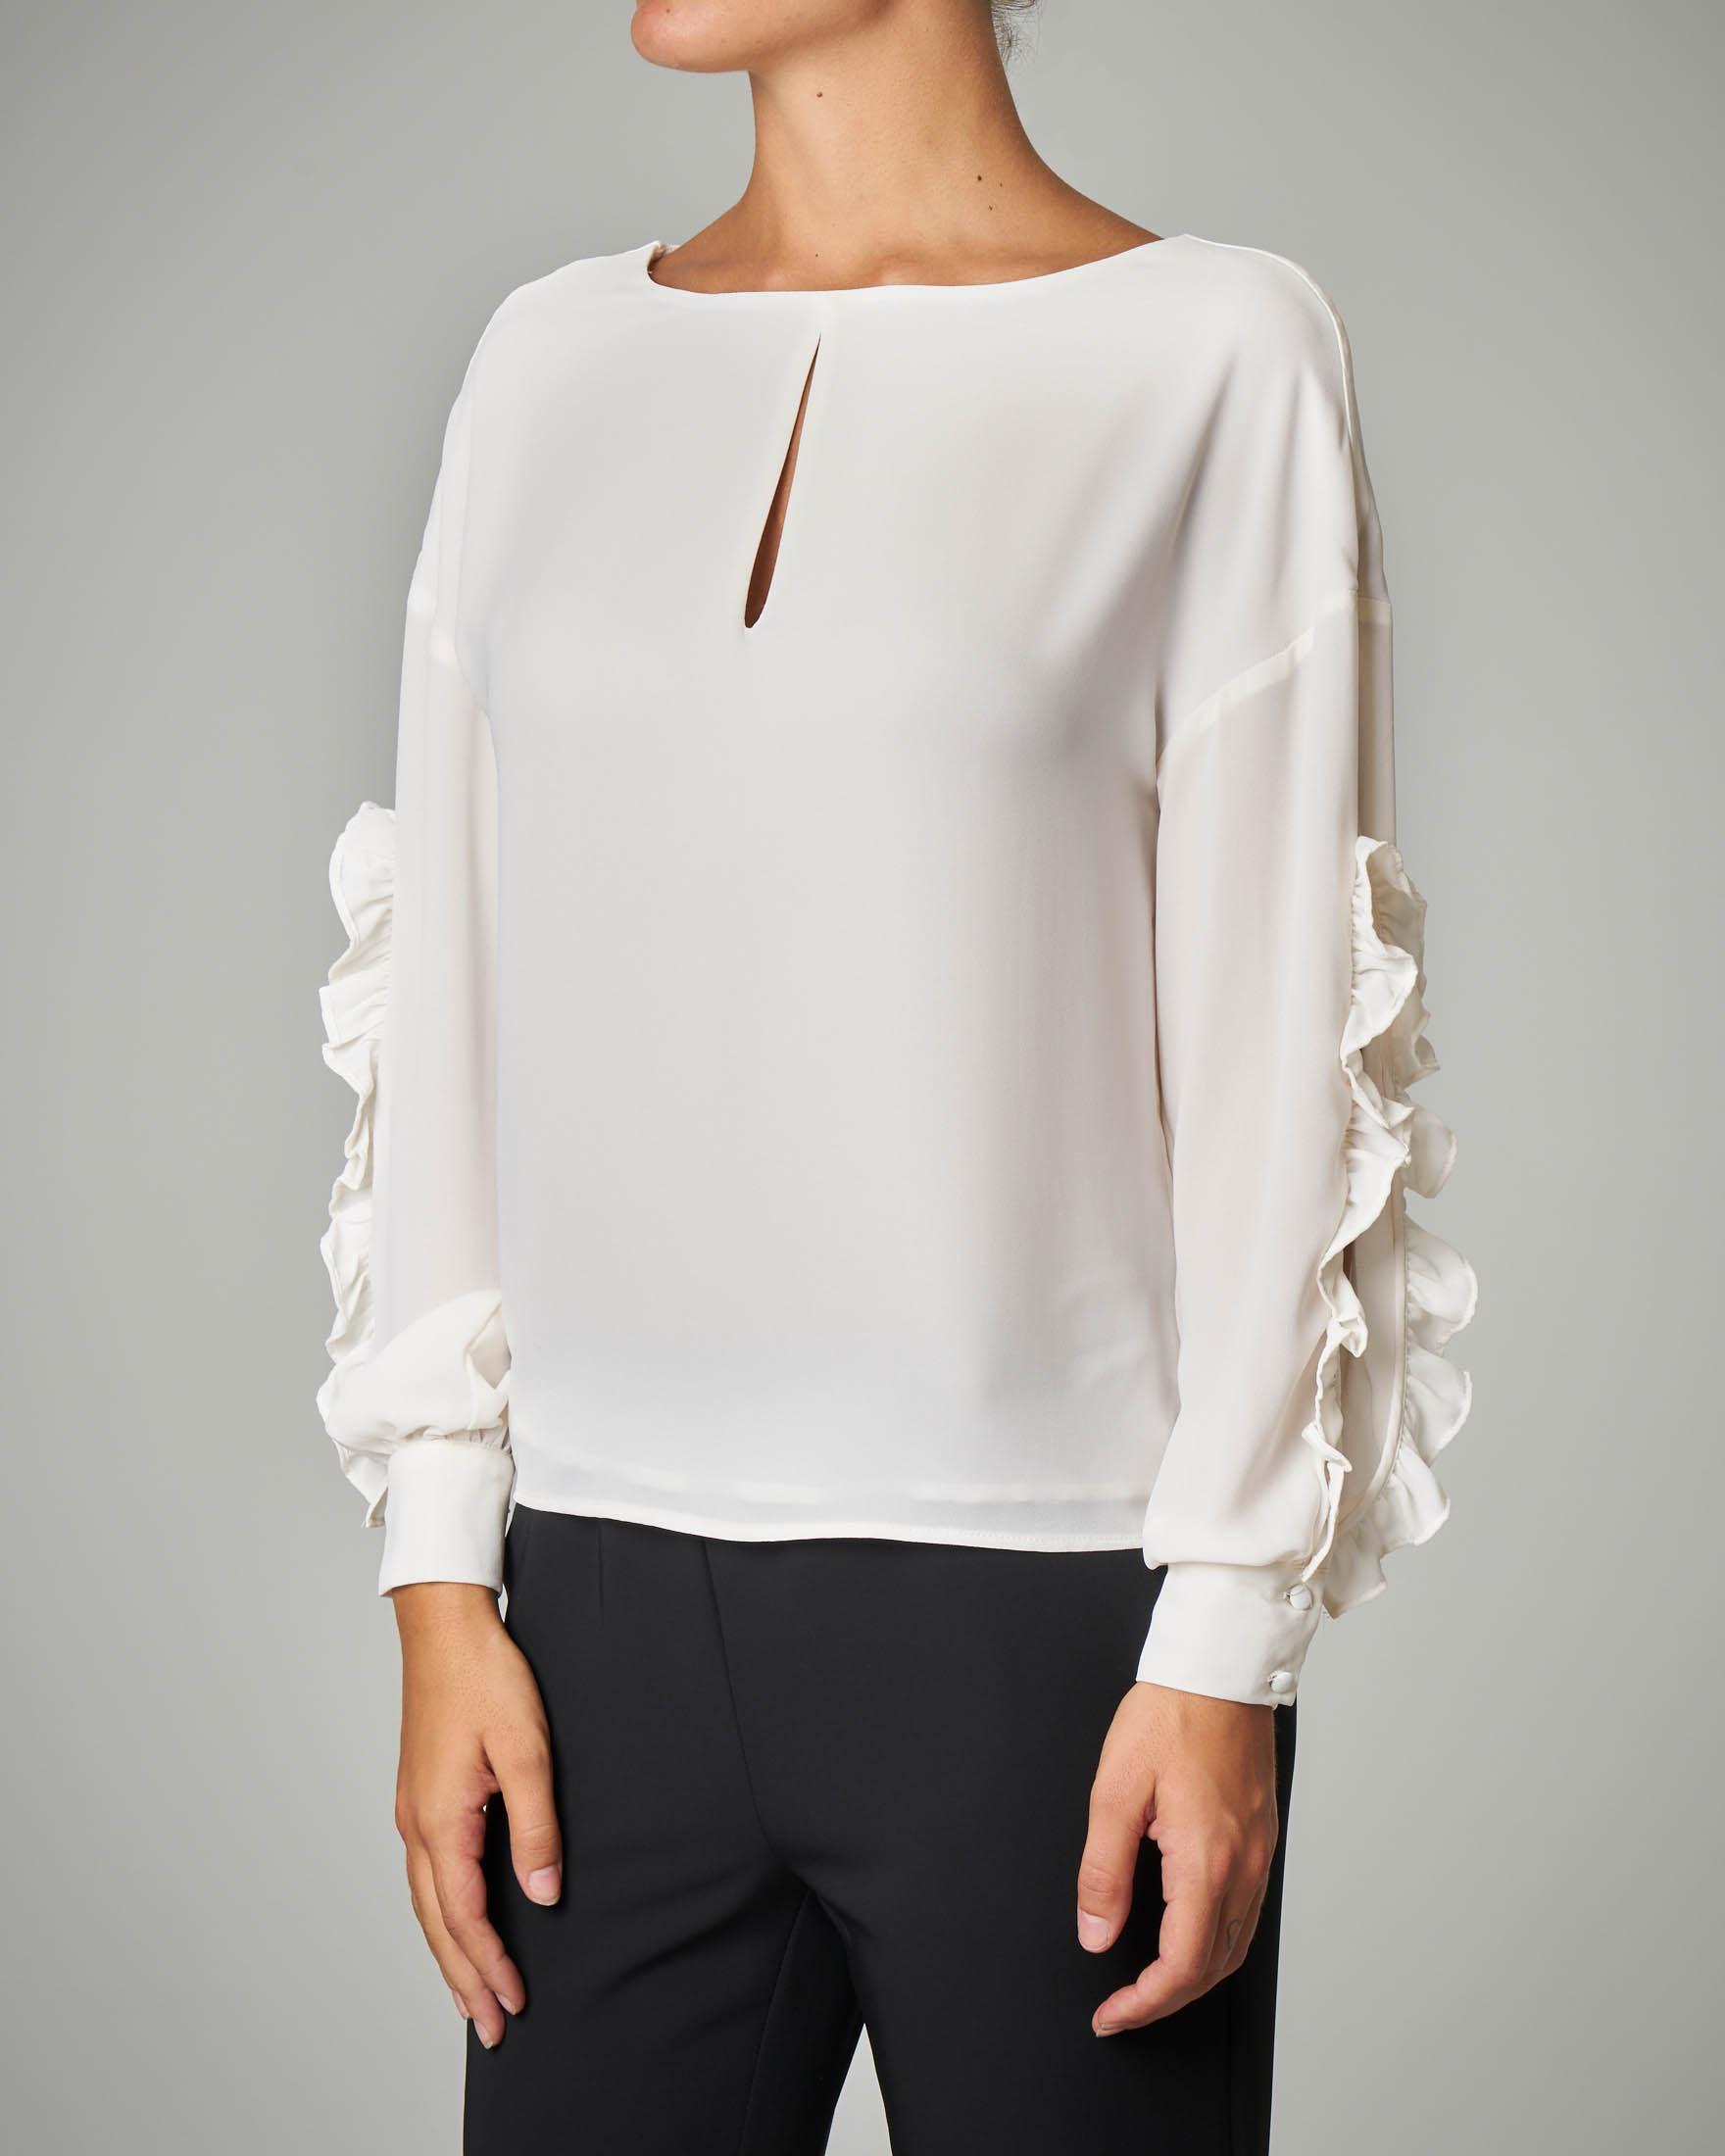 Blusa bianca con maniche lunghe